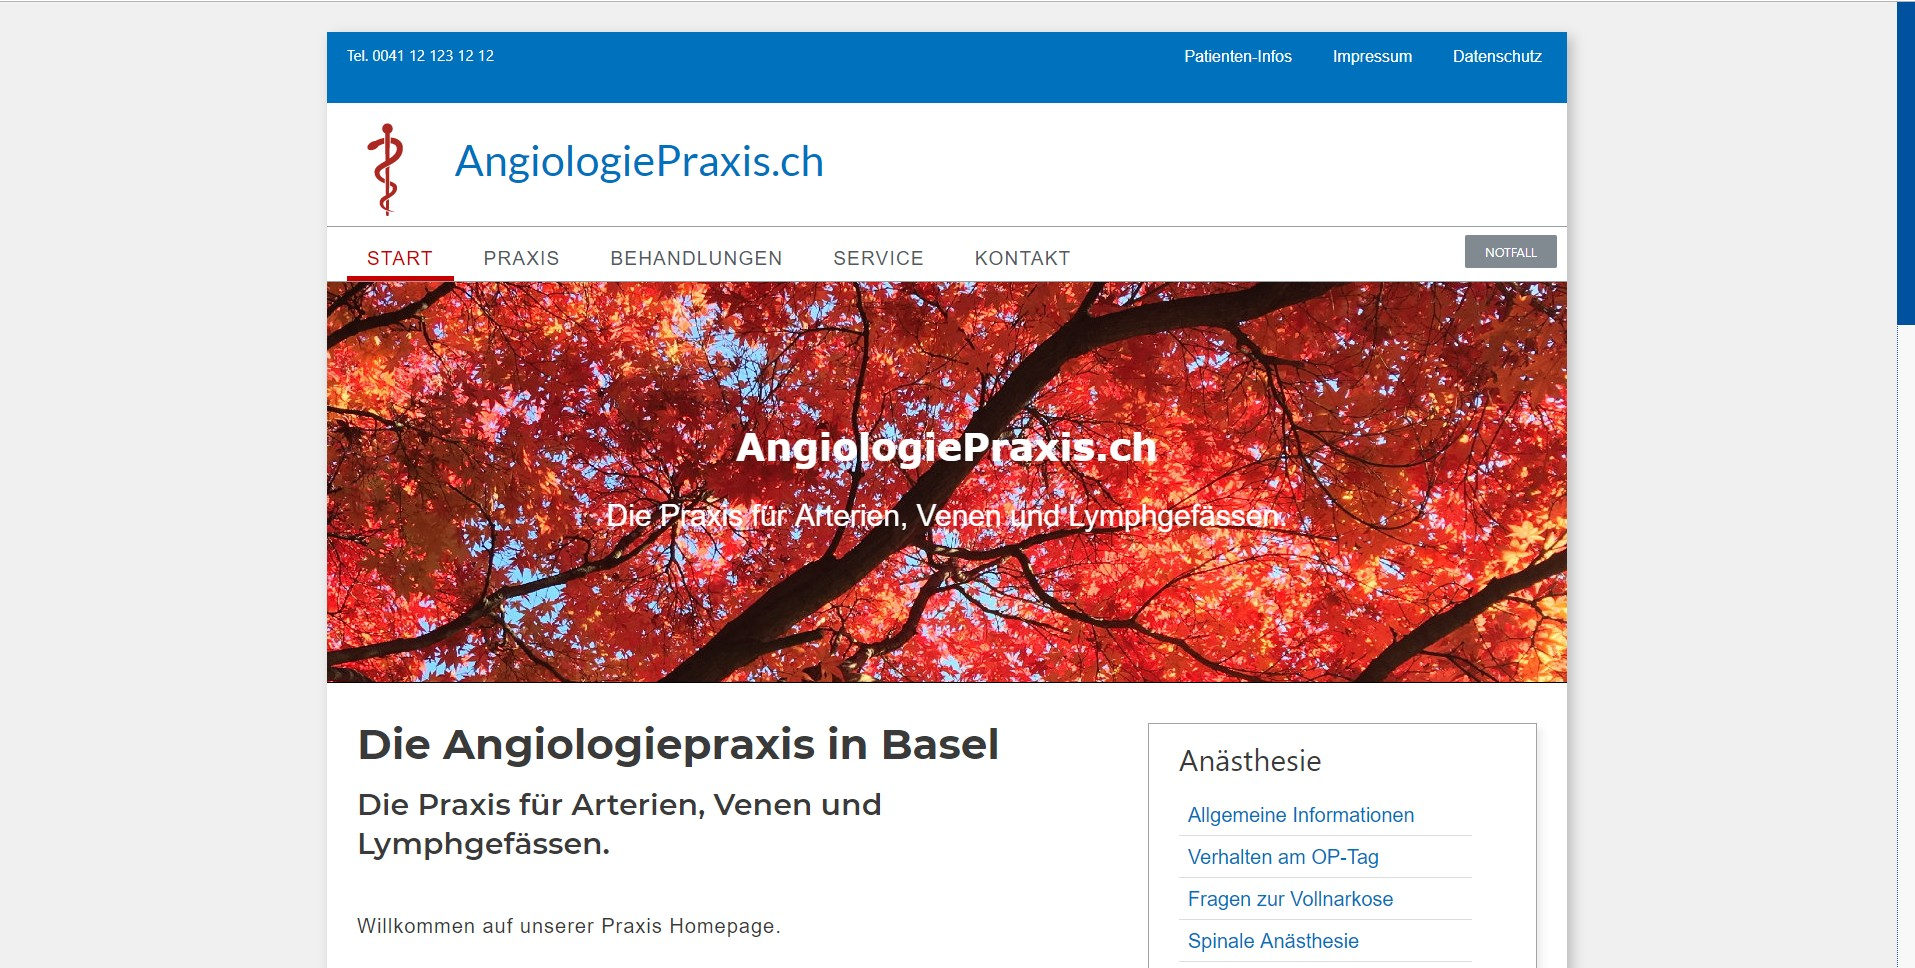 AngiologiePraxis.ch